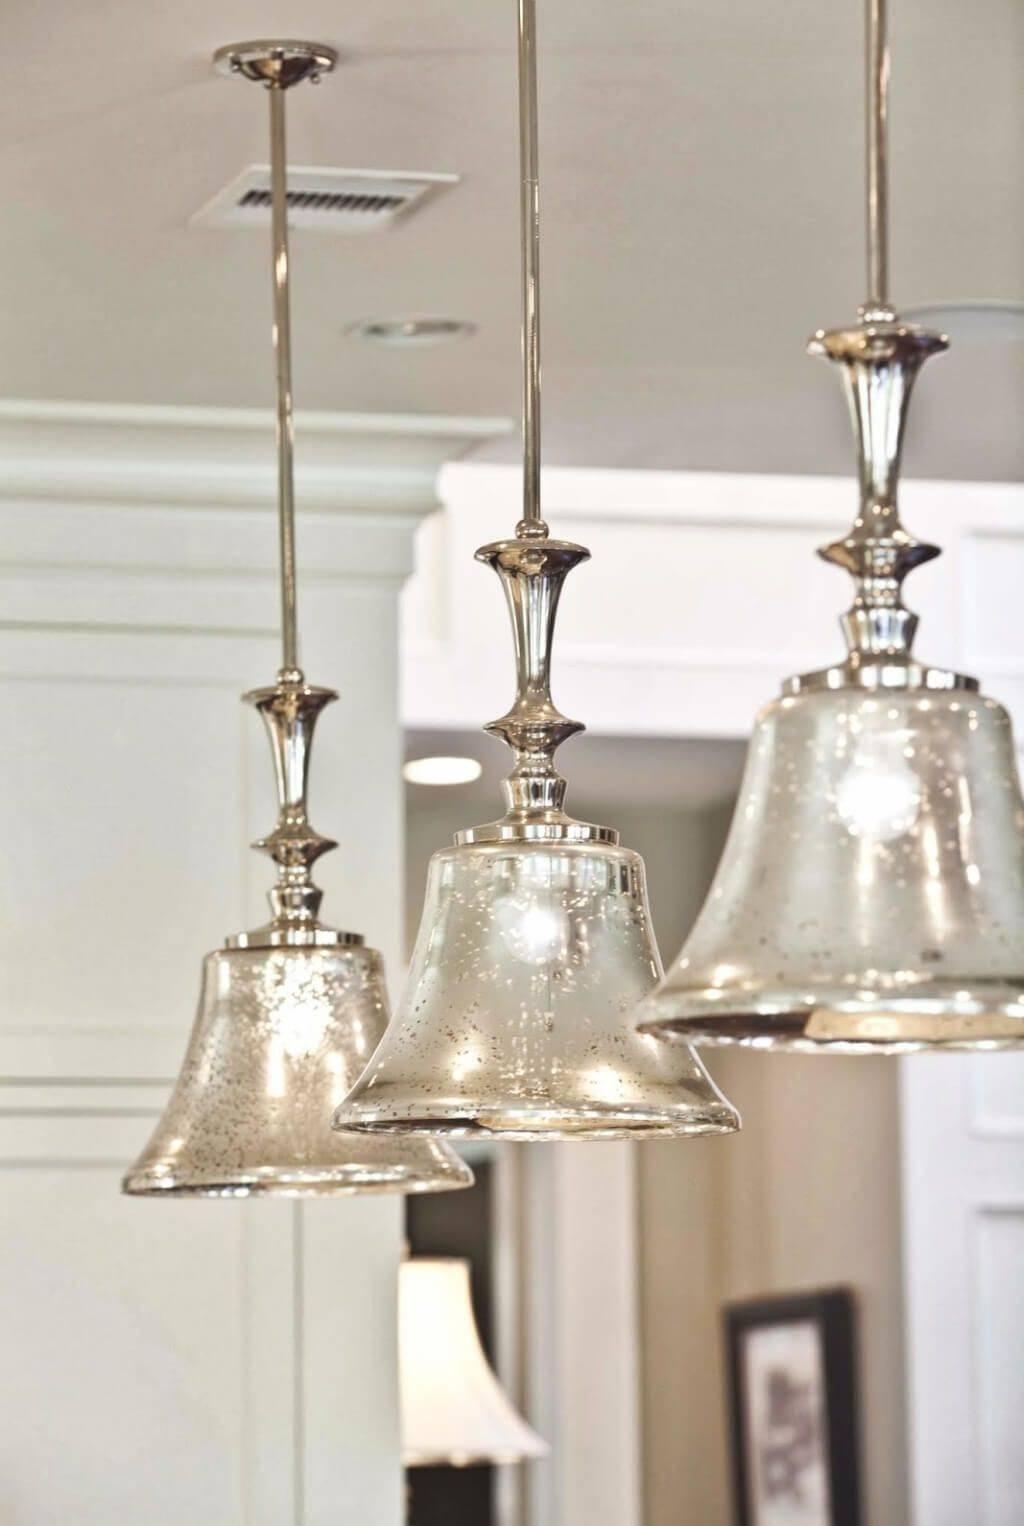 Lighting: Alluring Yellow Glass Pendant Lights Shade Design throughout Murano Glass Pendant Lighting (Image 4 of 15)